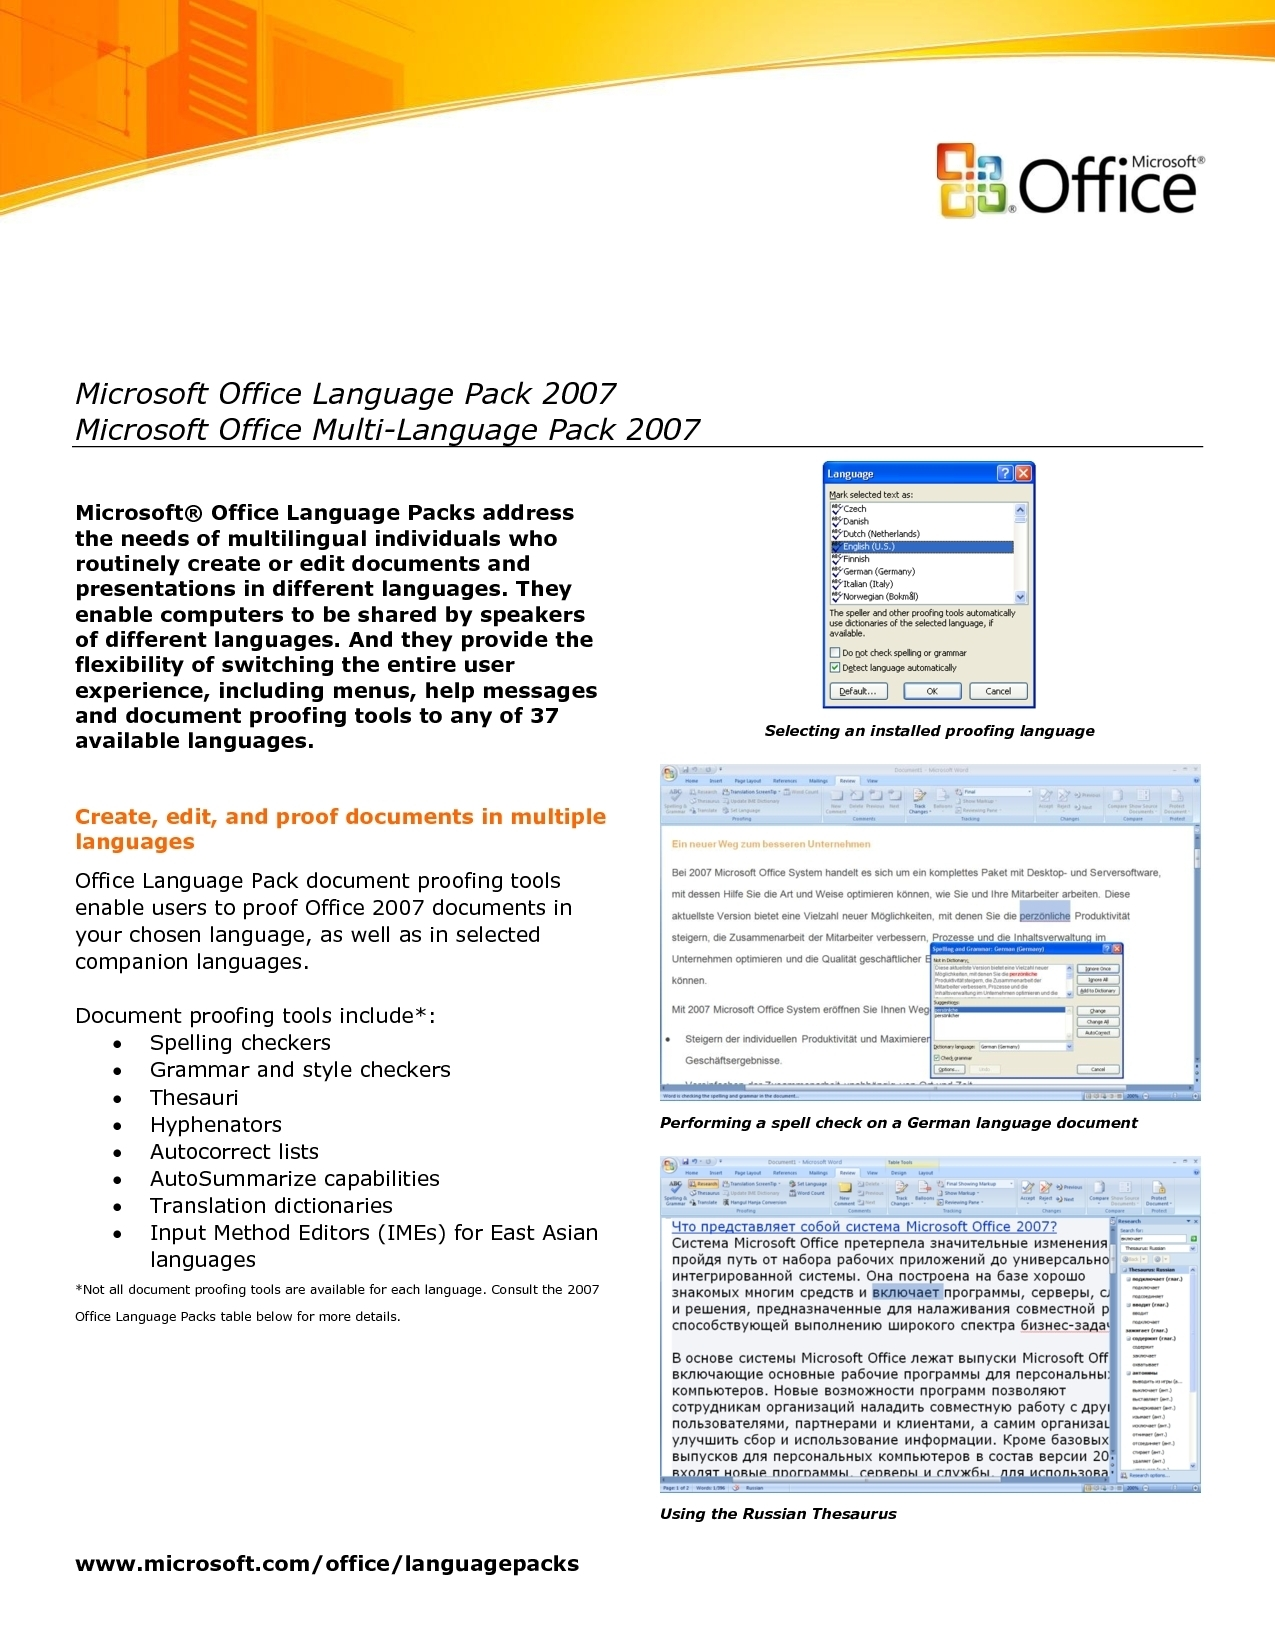 office invoice template office invoice template free at microsoft design invoice template 1275 X 1650